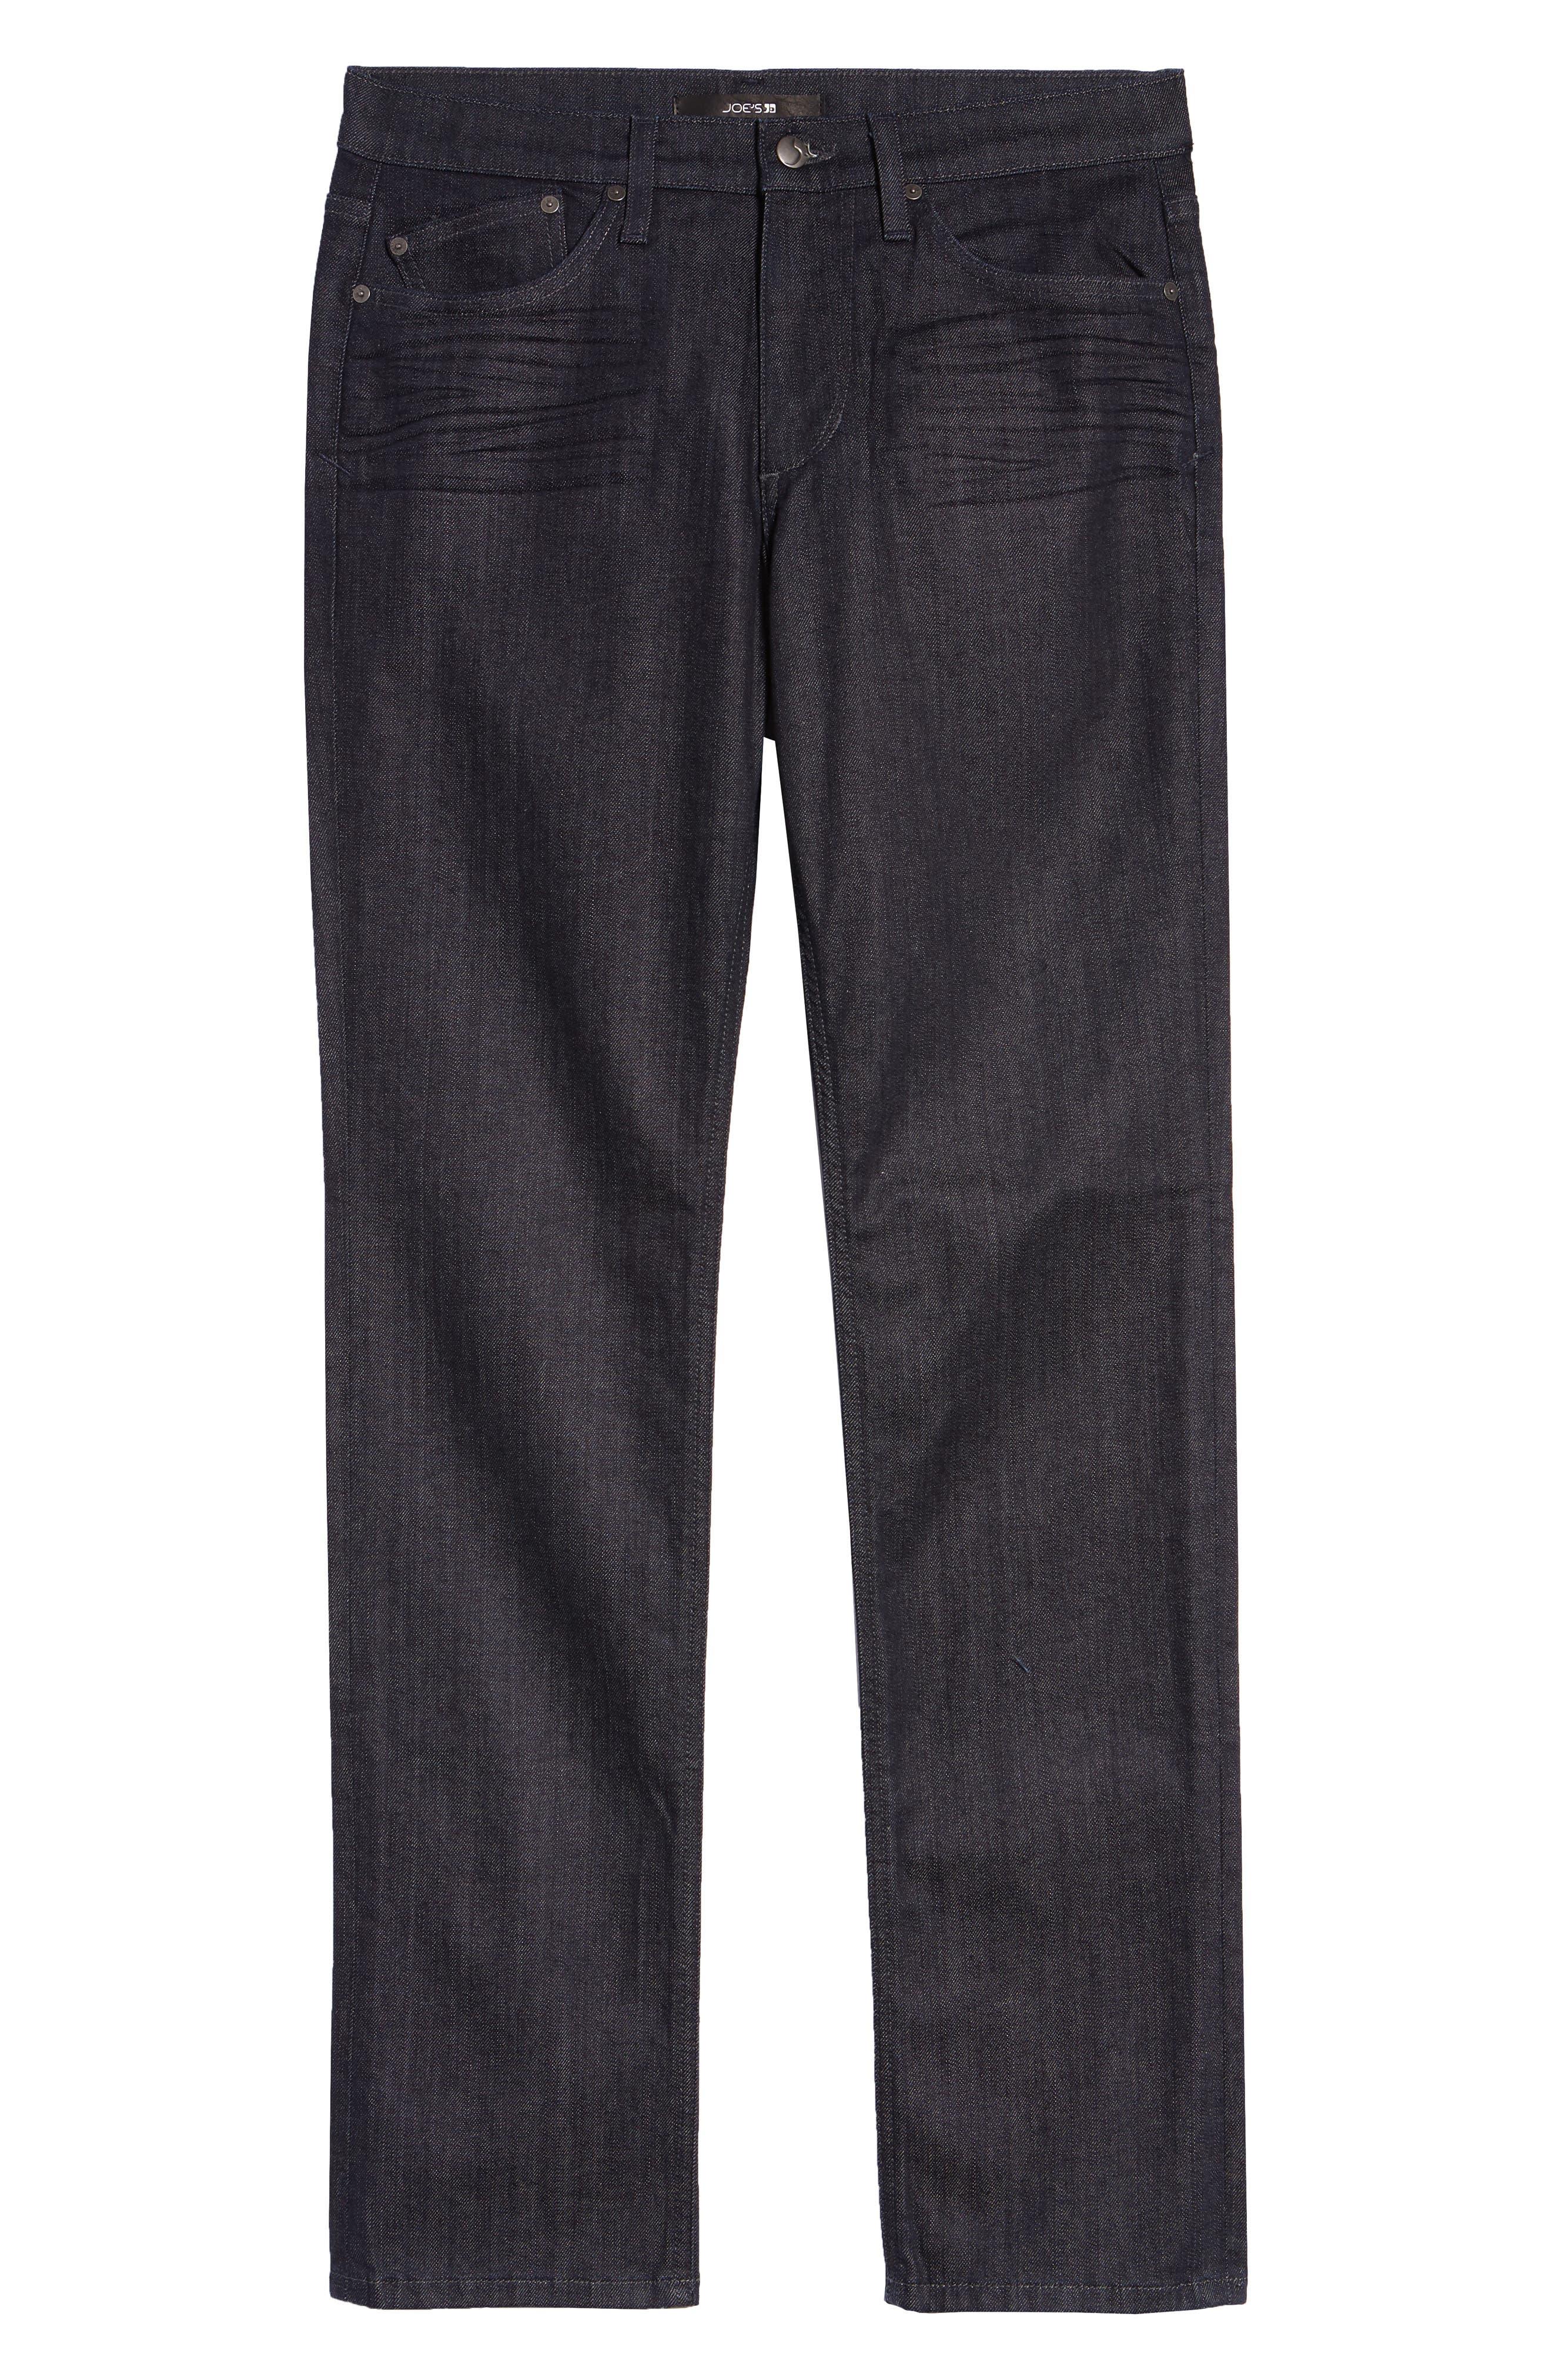 Brixton Slim Straight Fit Jeans,                             Alternate thumbnail 2, color,                             KING